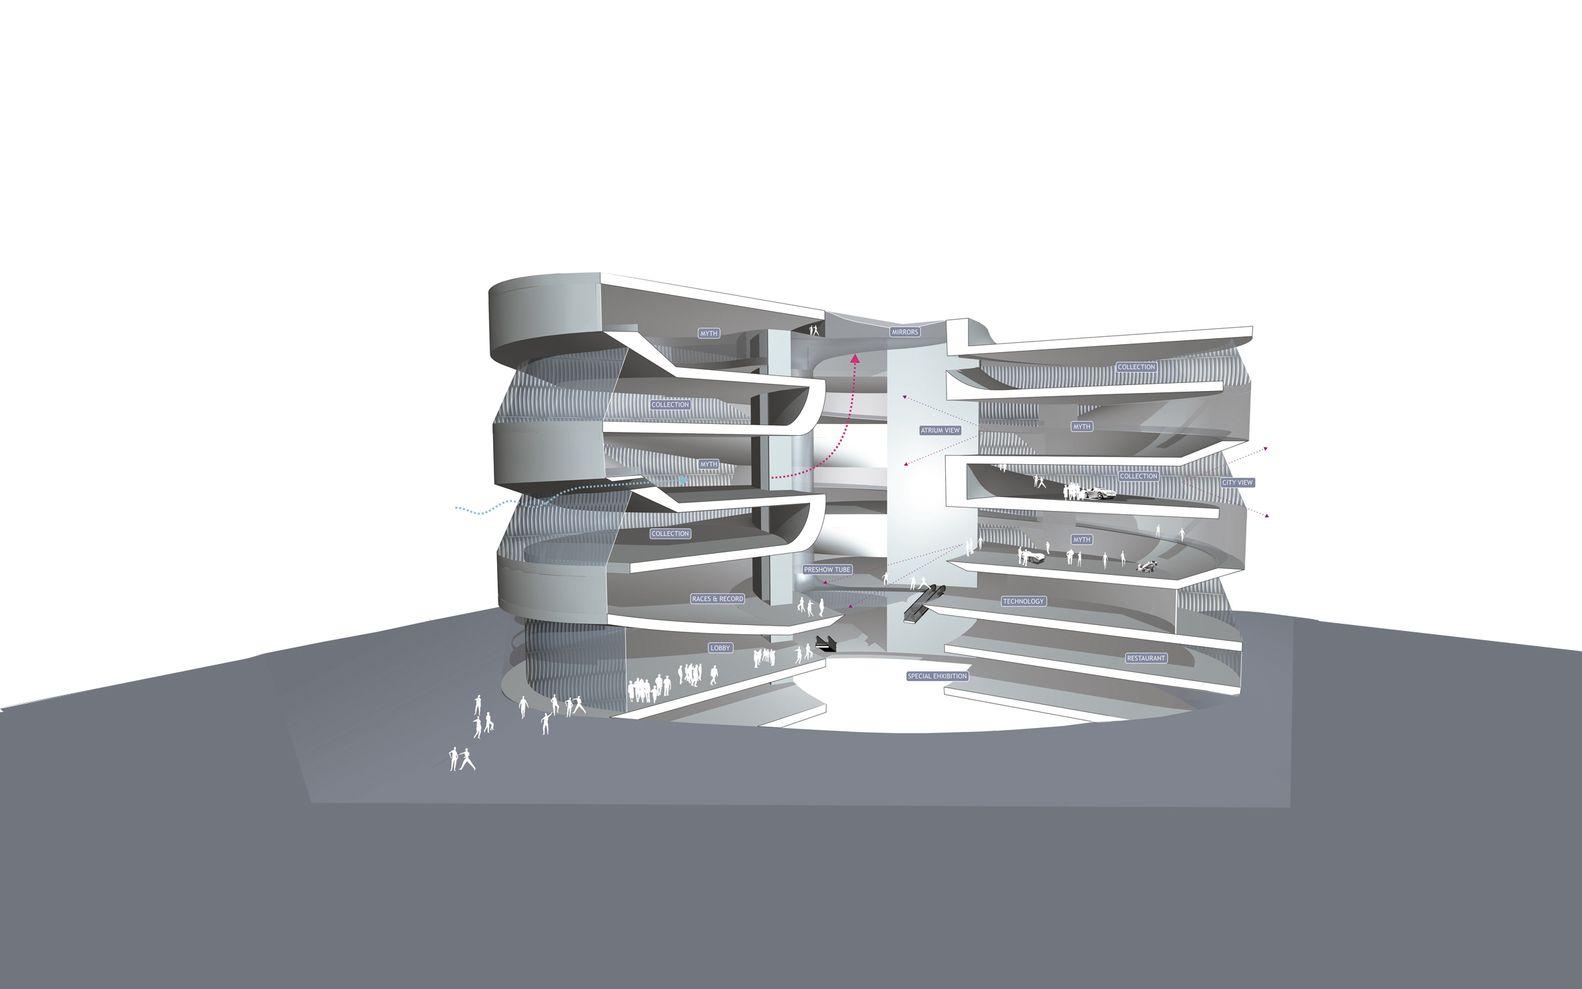 Mercedes-Benz Museum,Diagram